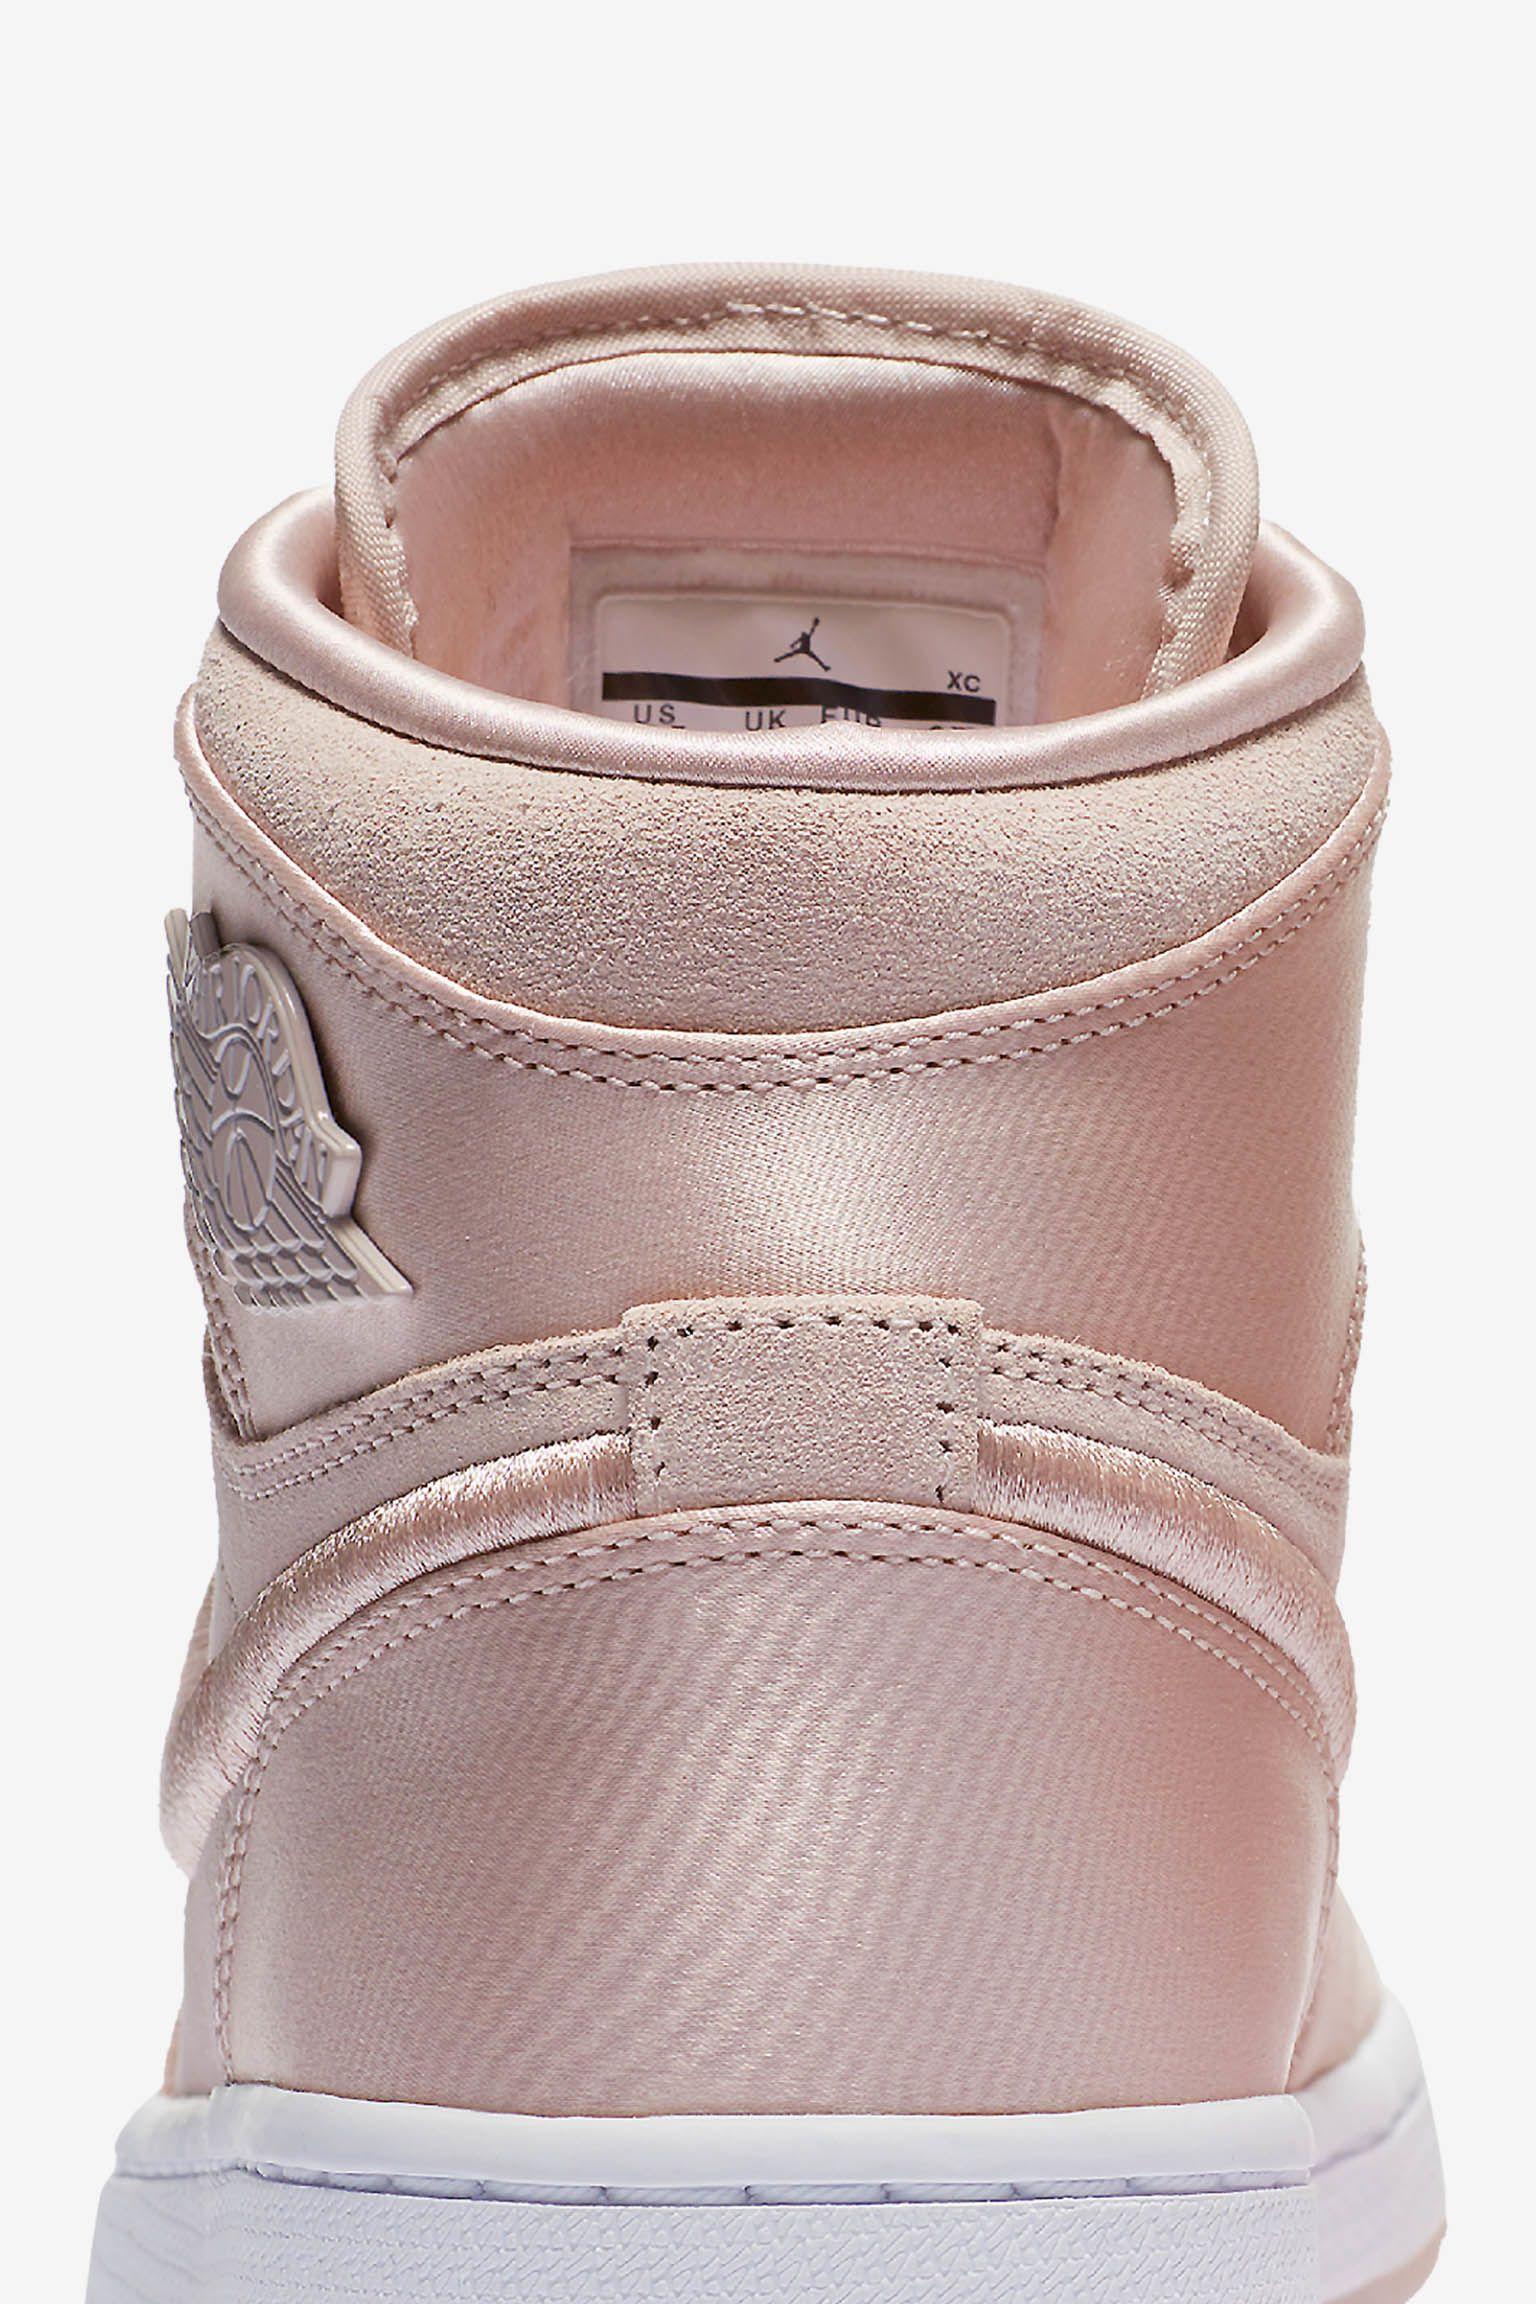 Women s Air Jordan 1 Retro High  Red Silt  Release Date. Nike+ SNKRS b009864950c1